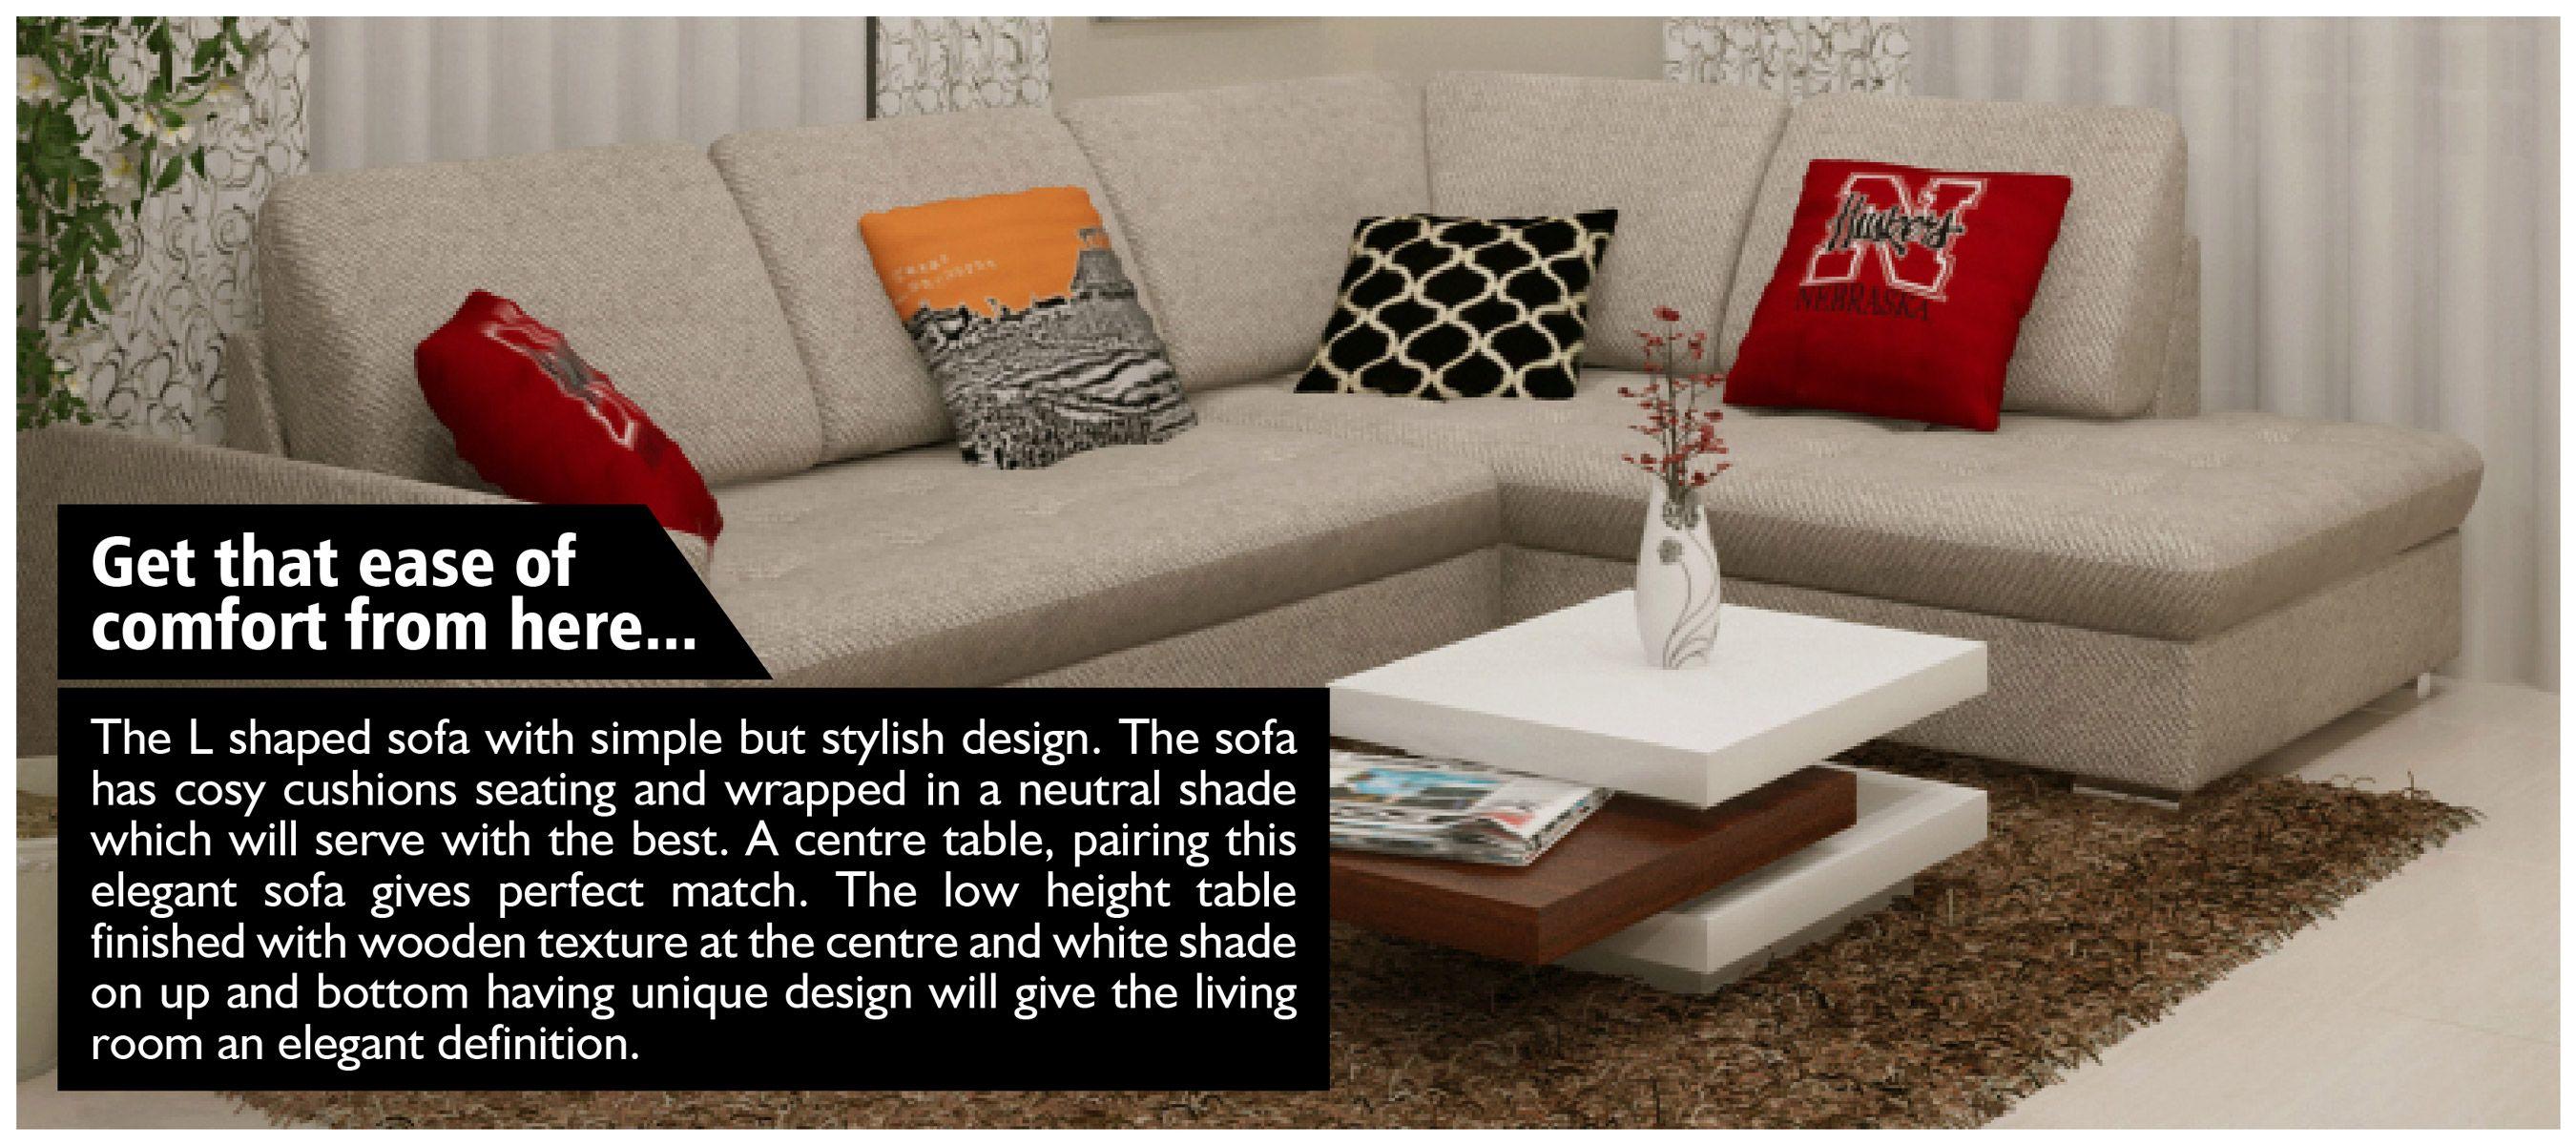 Get That Ease Of Comfort Here Sofa Living Centertable Best Interior Interior Decorating Design